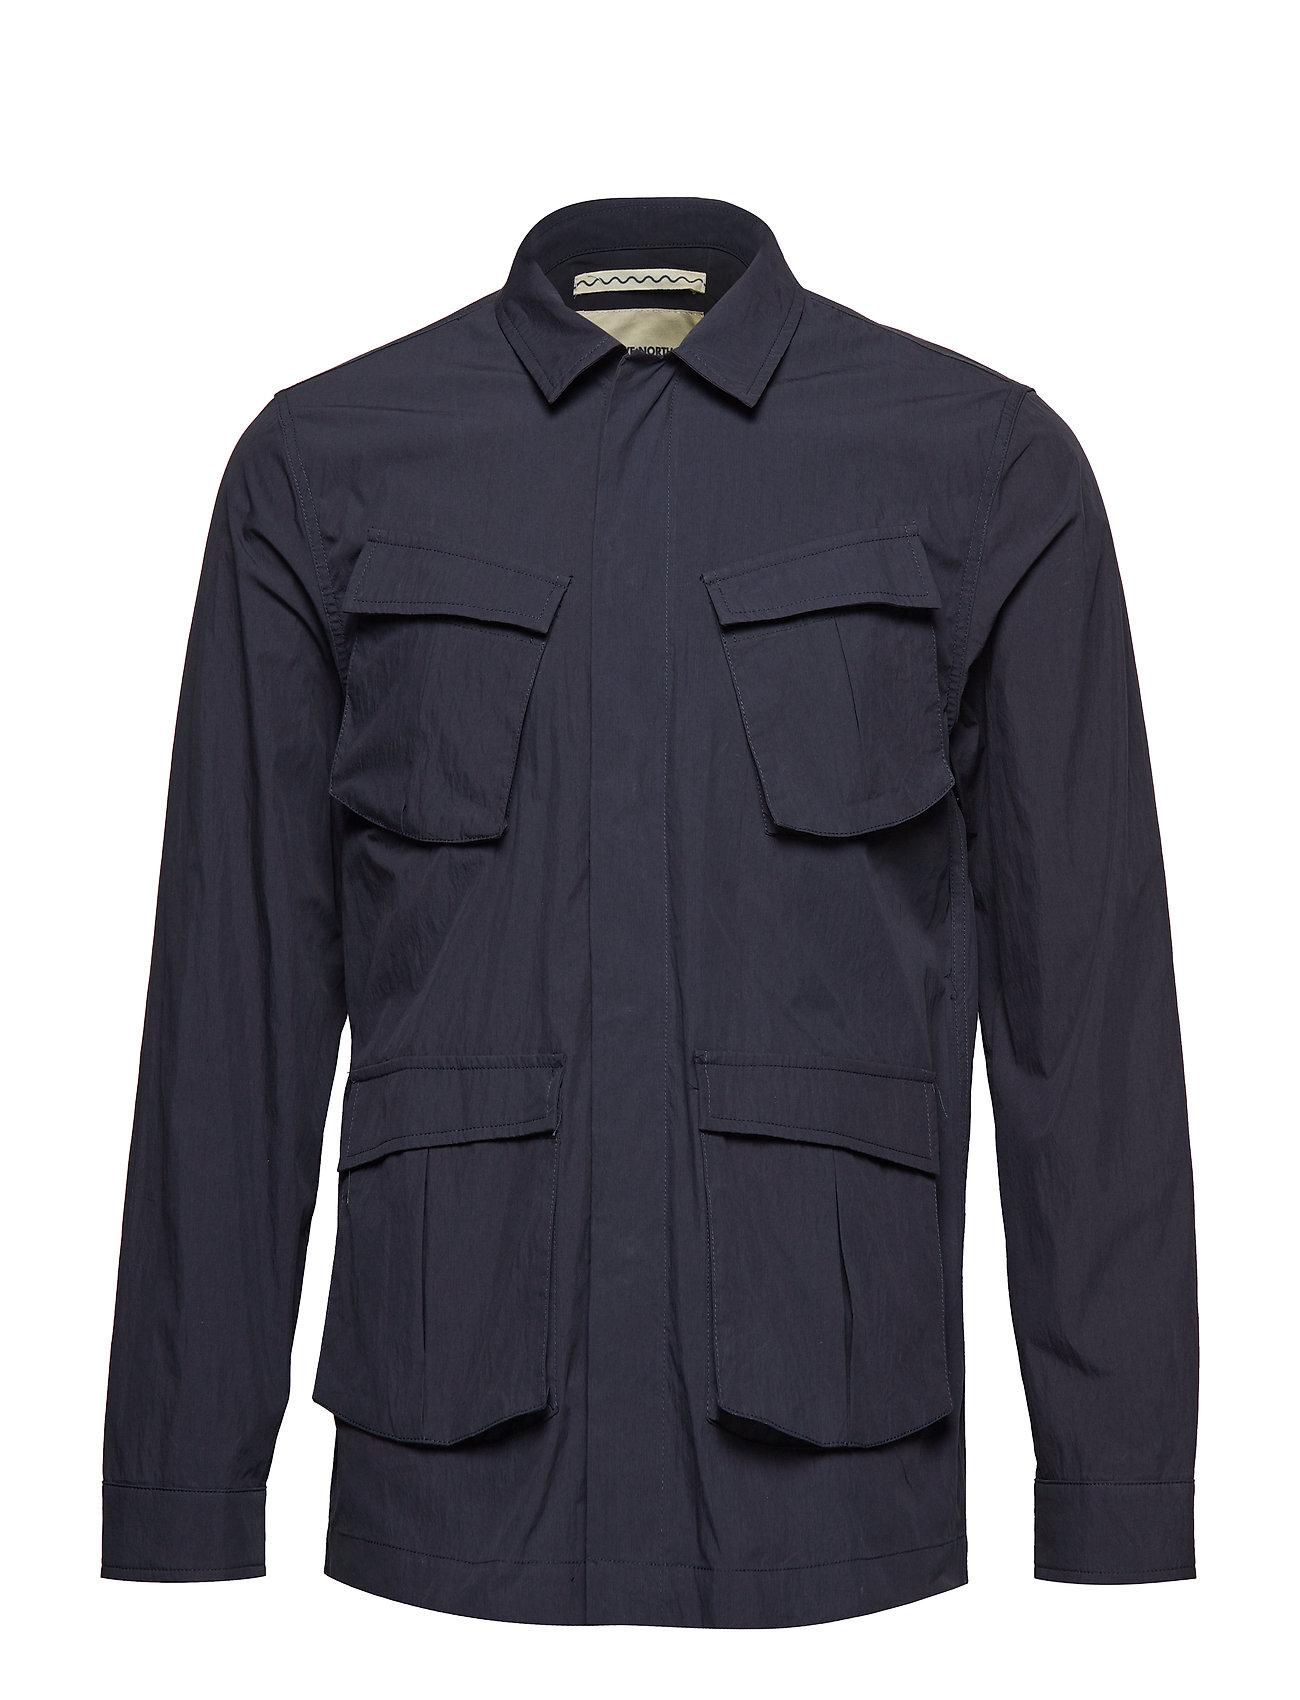 Image of Thorvald Paper Jacket Overshirt Blå Native North (3127175161)